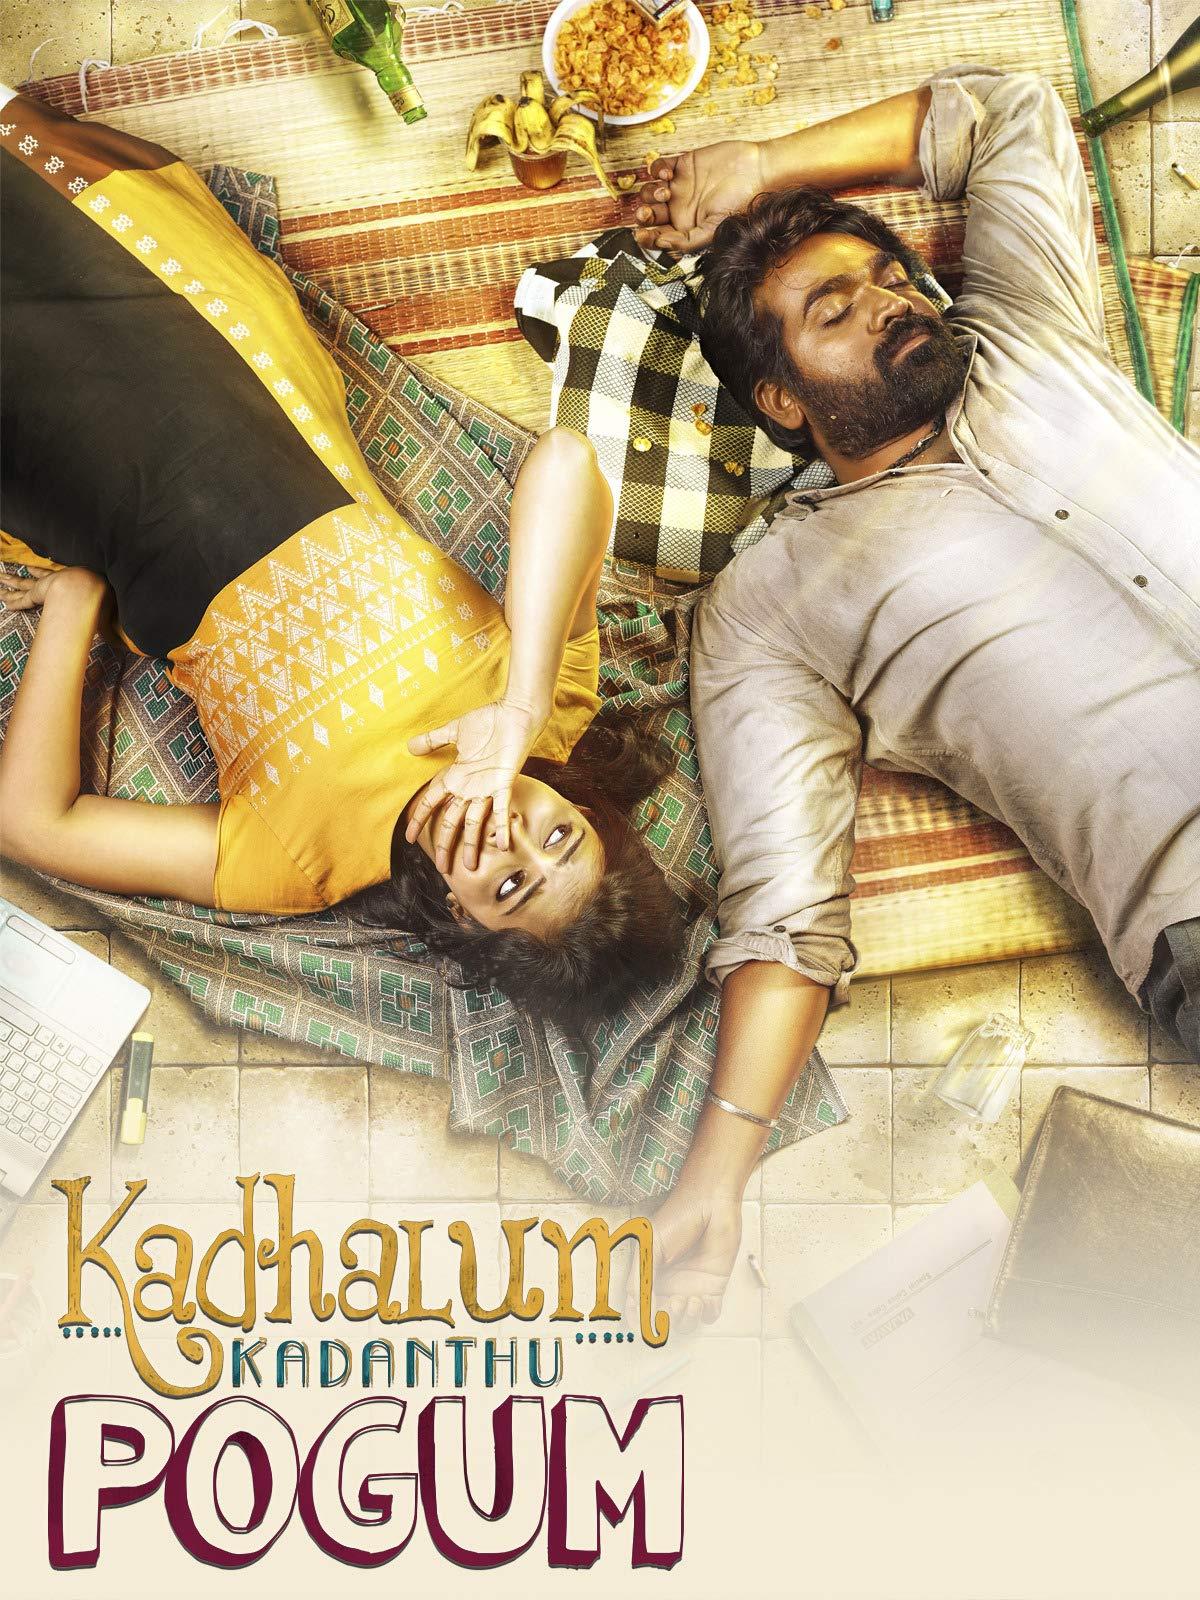 Kadhalum Kadandhu Pogum on Amazon Prime Video UK